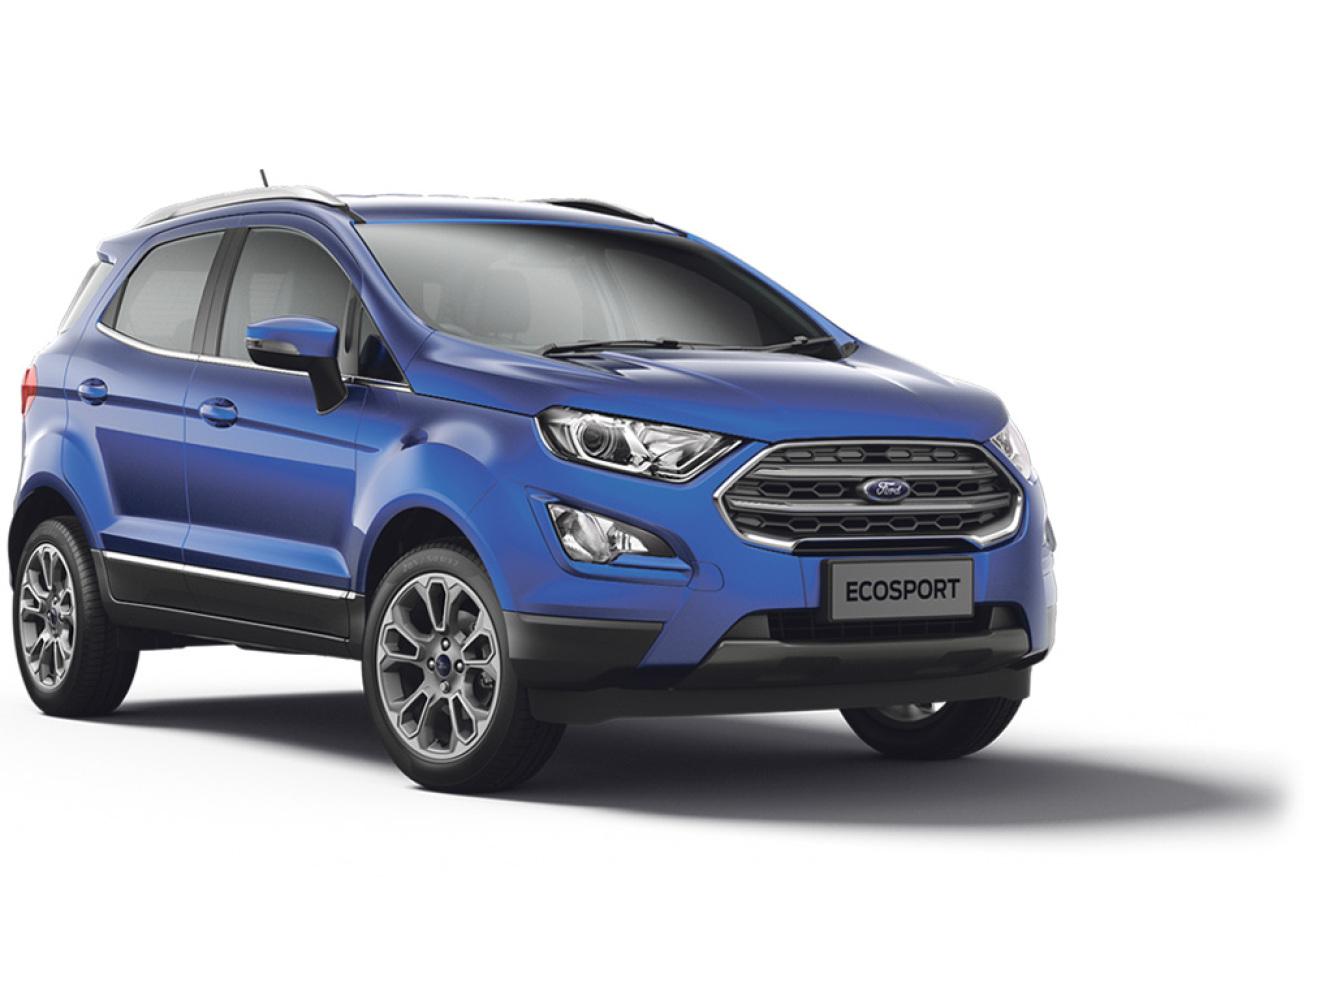 new ford ecosport 1 0 ecoboost 125 titanium 5dr petrol. Black Bedroom Furniture Sets. Home Design Ideas